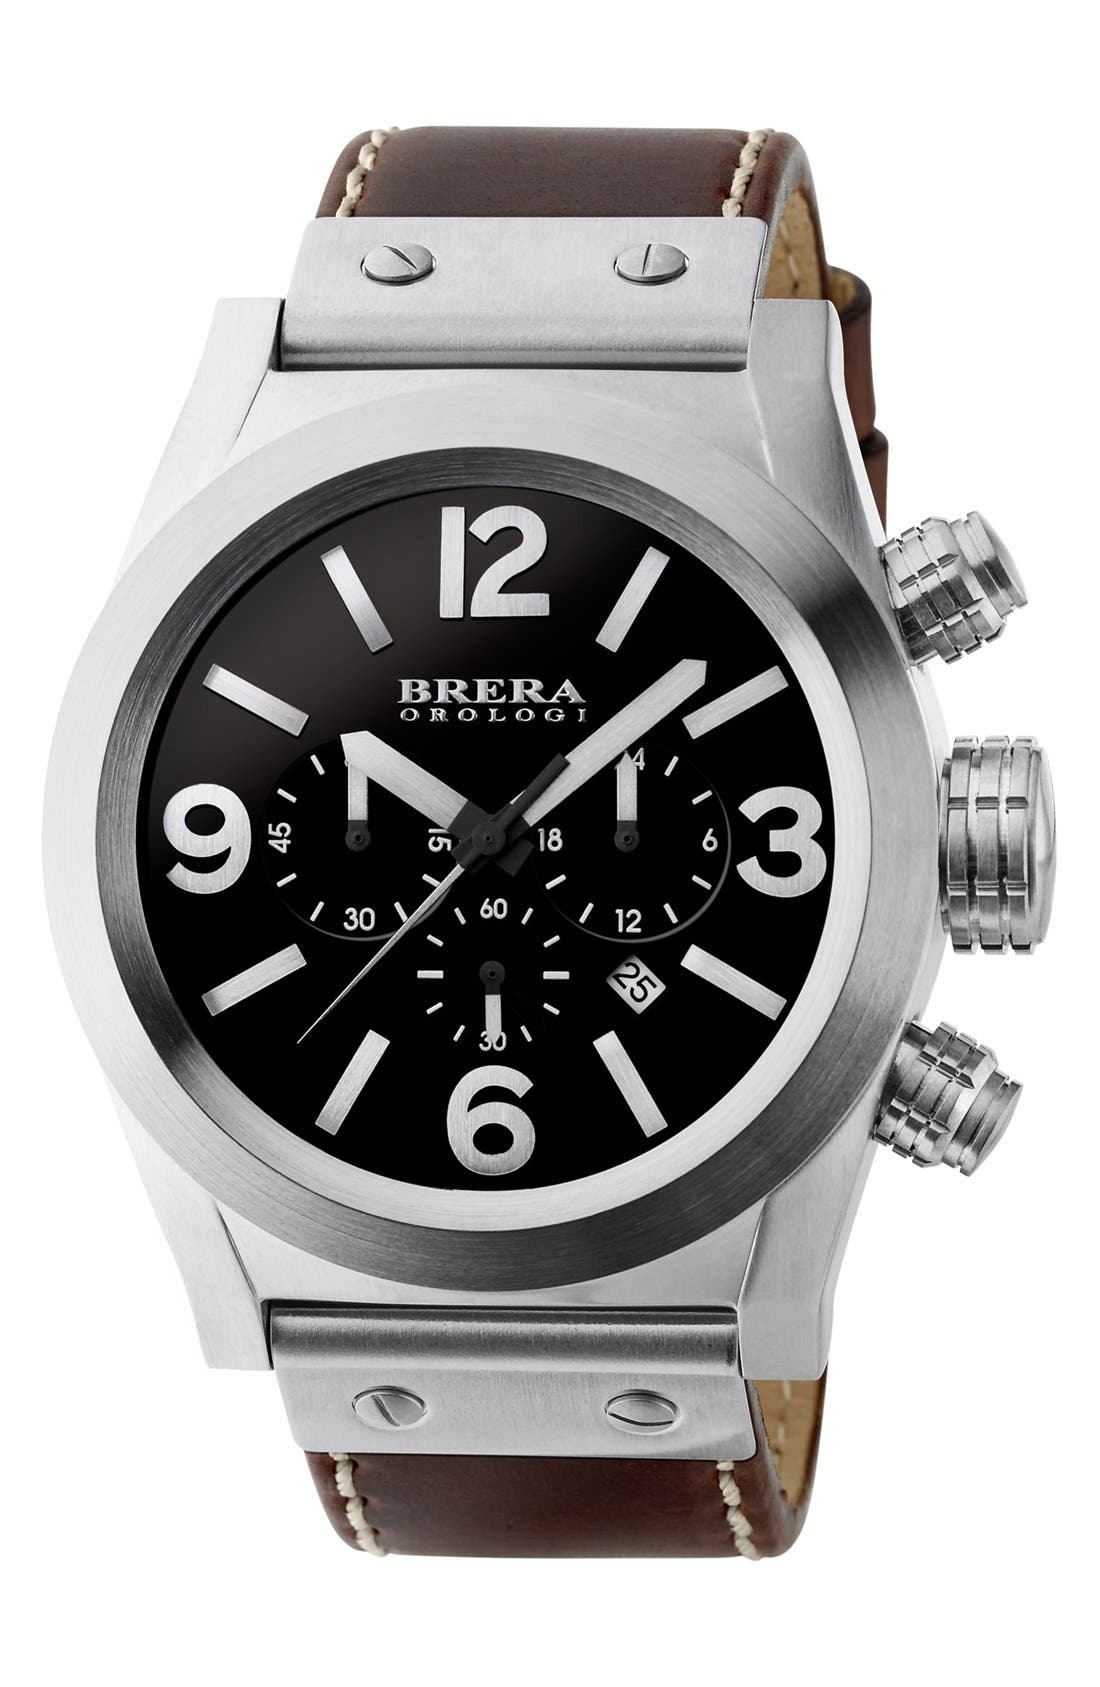 Main Image - Brera 'Eterno Chrono' Chronograph Leather Strap Watch, 45mm